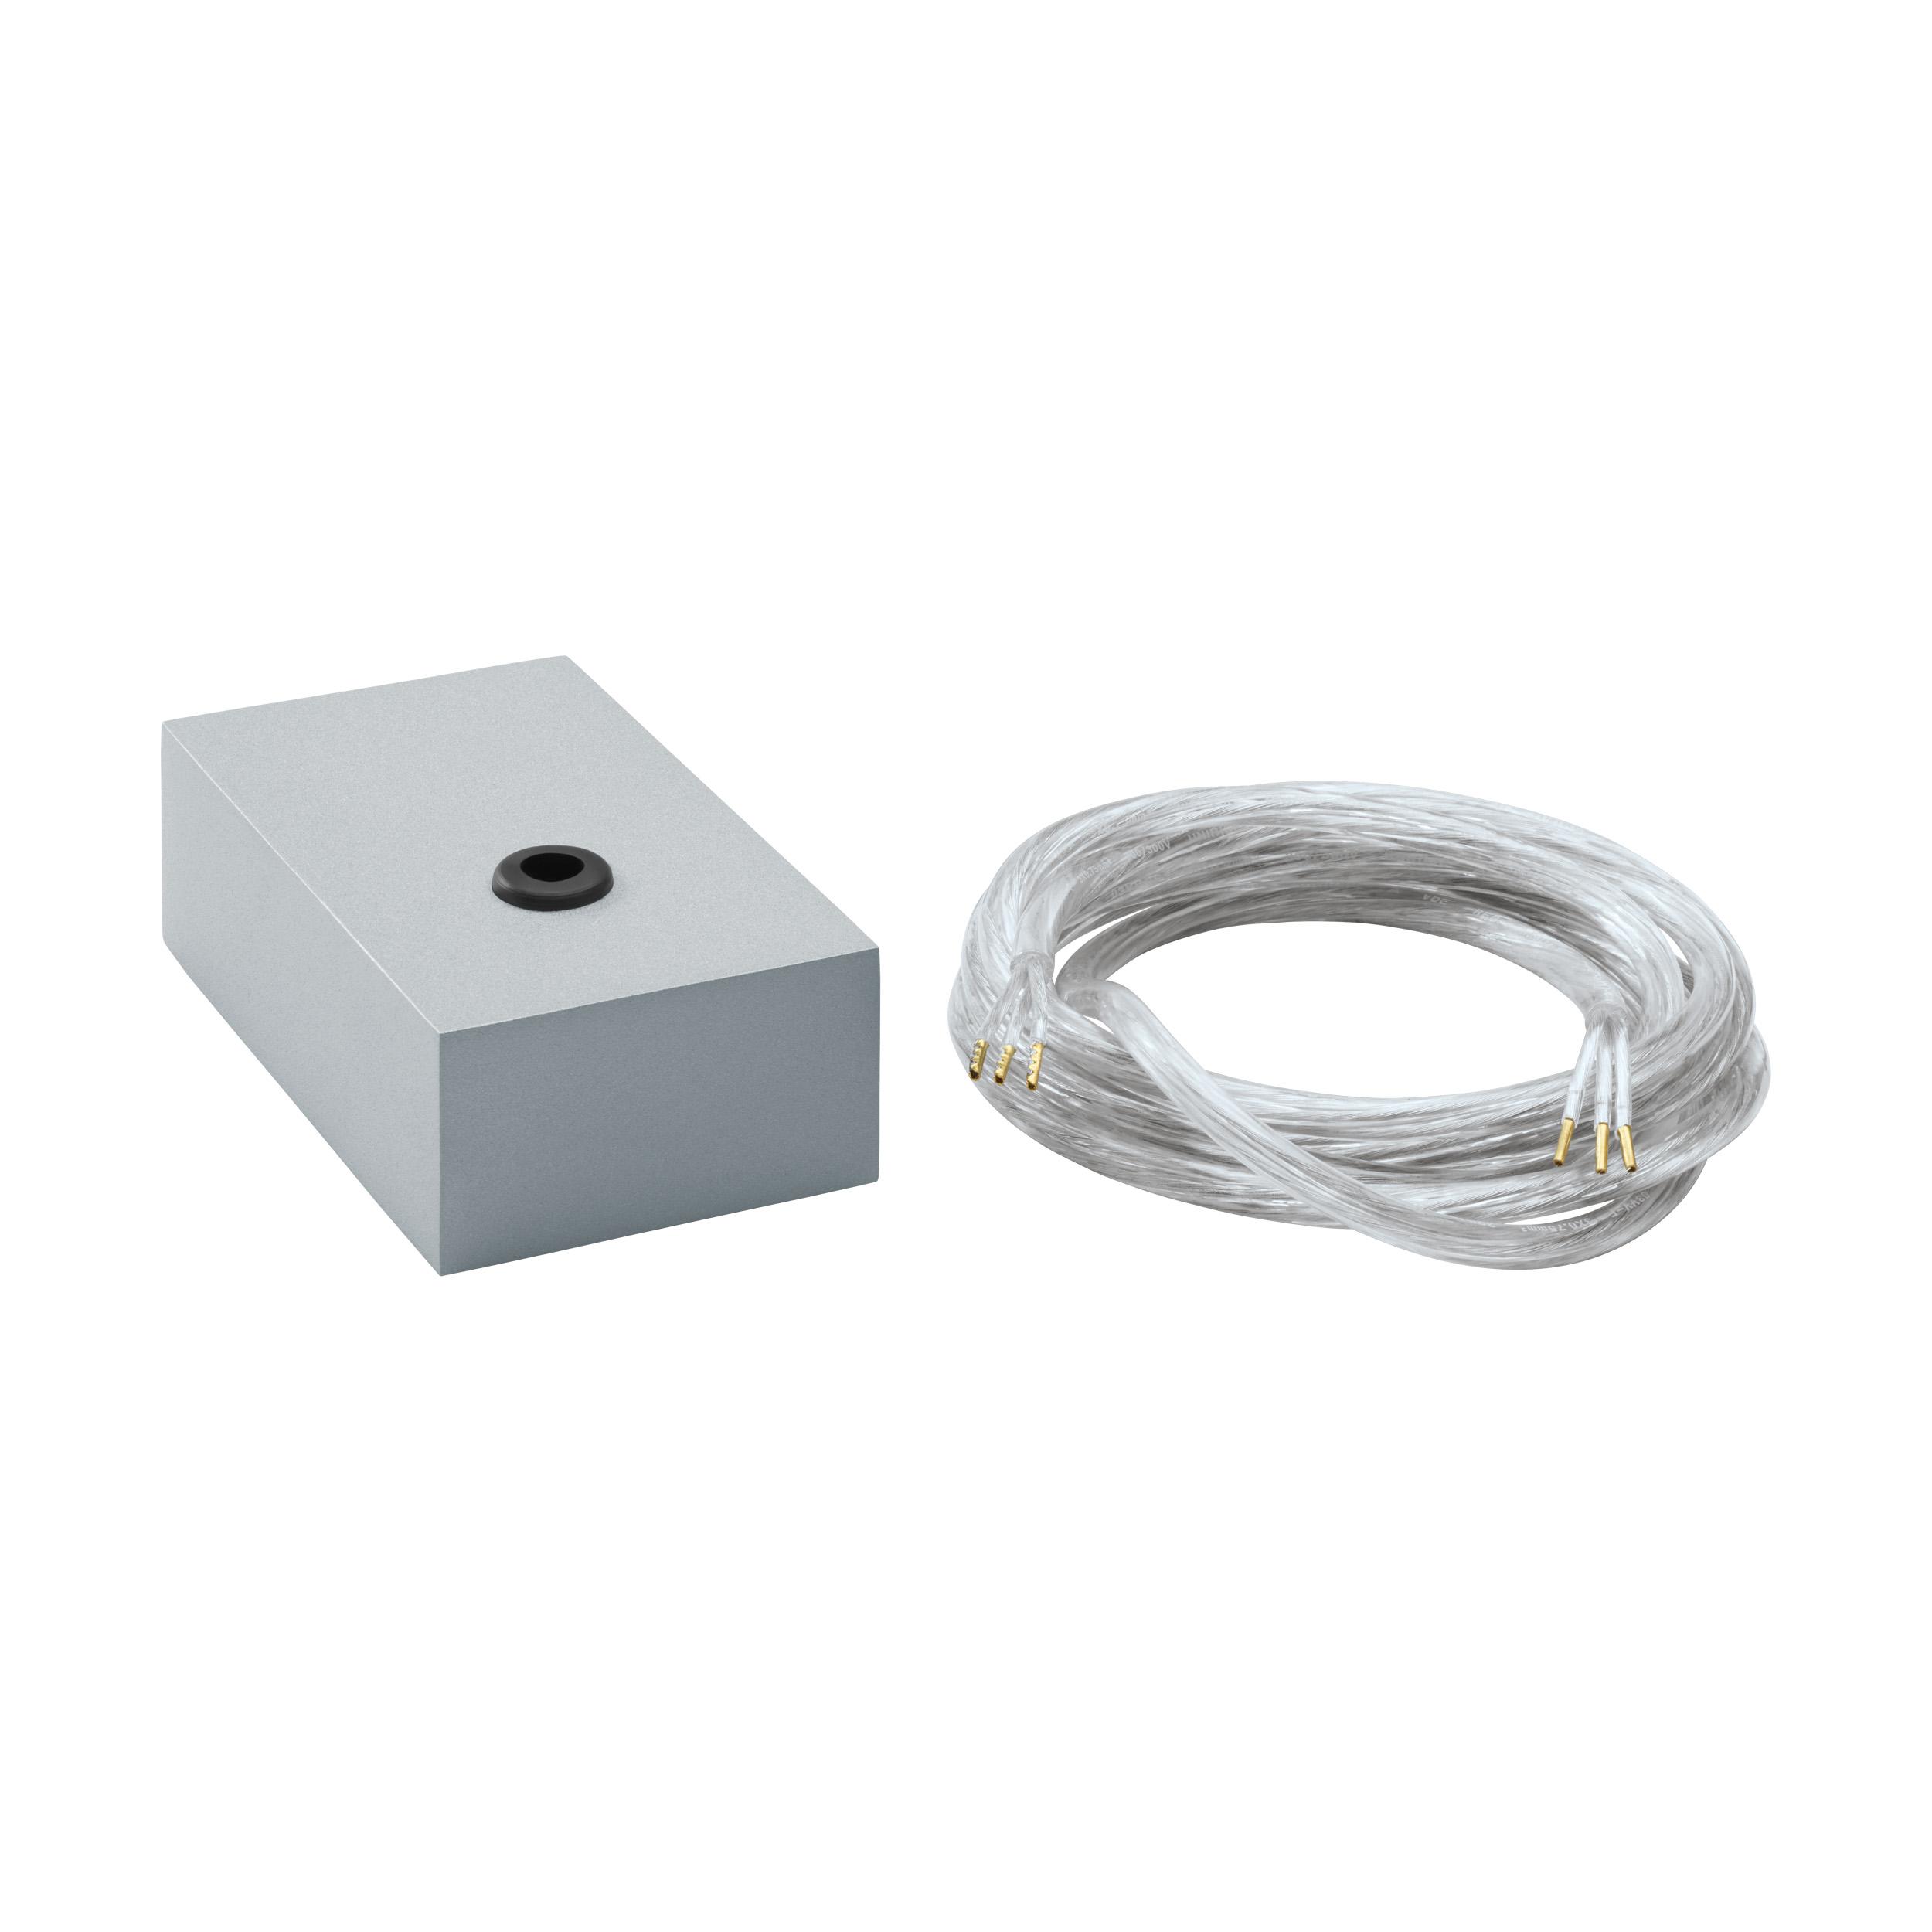 1 Stk Einspeisung 5 polig Aluminium eloxiert IP20 LI65121---